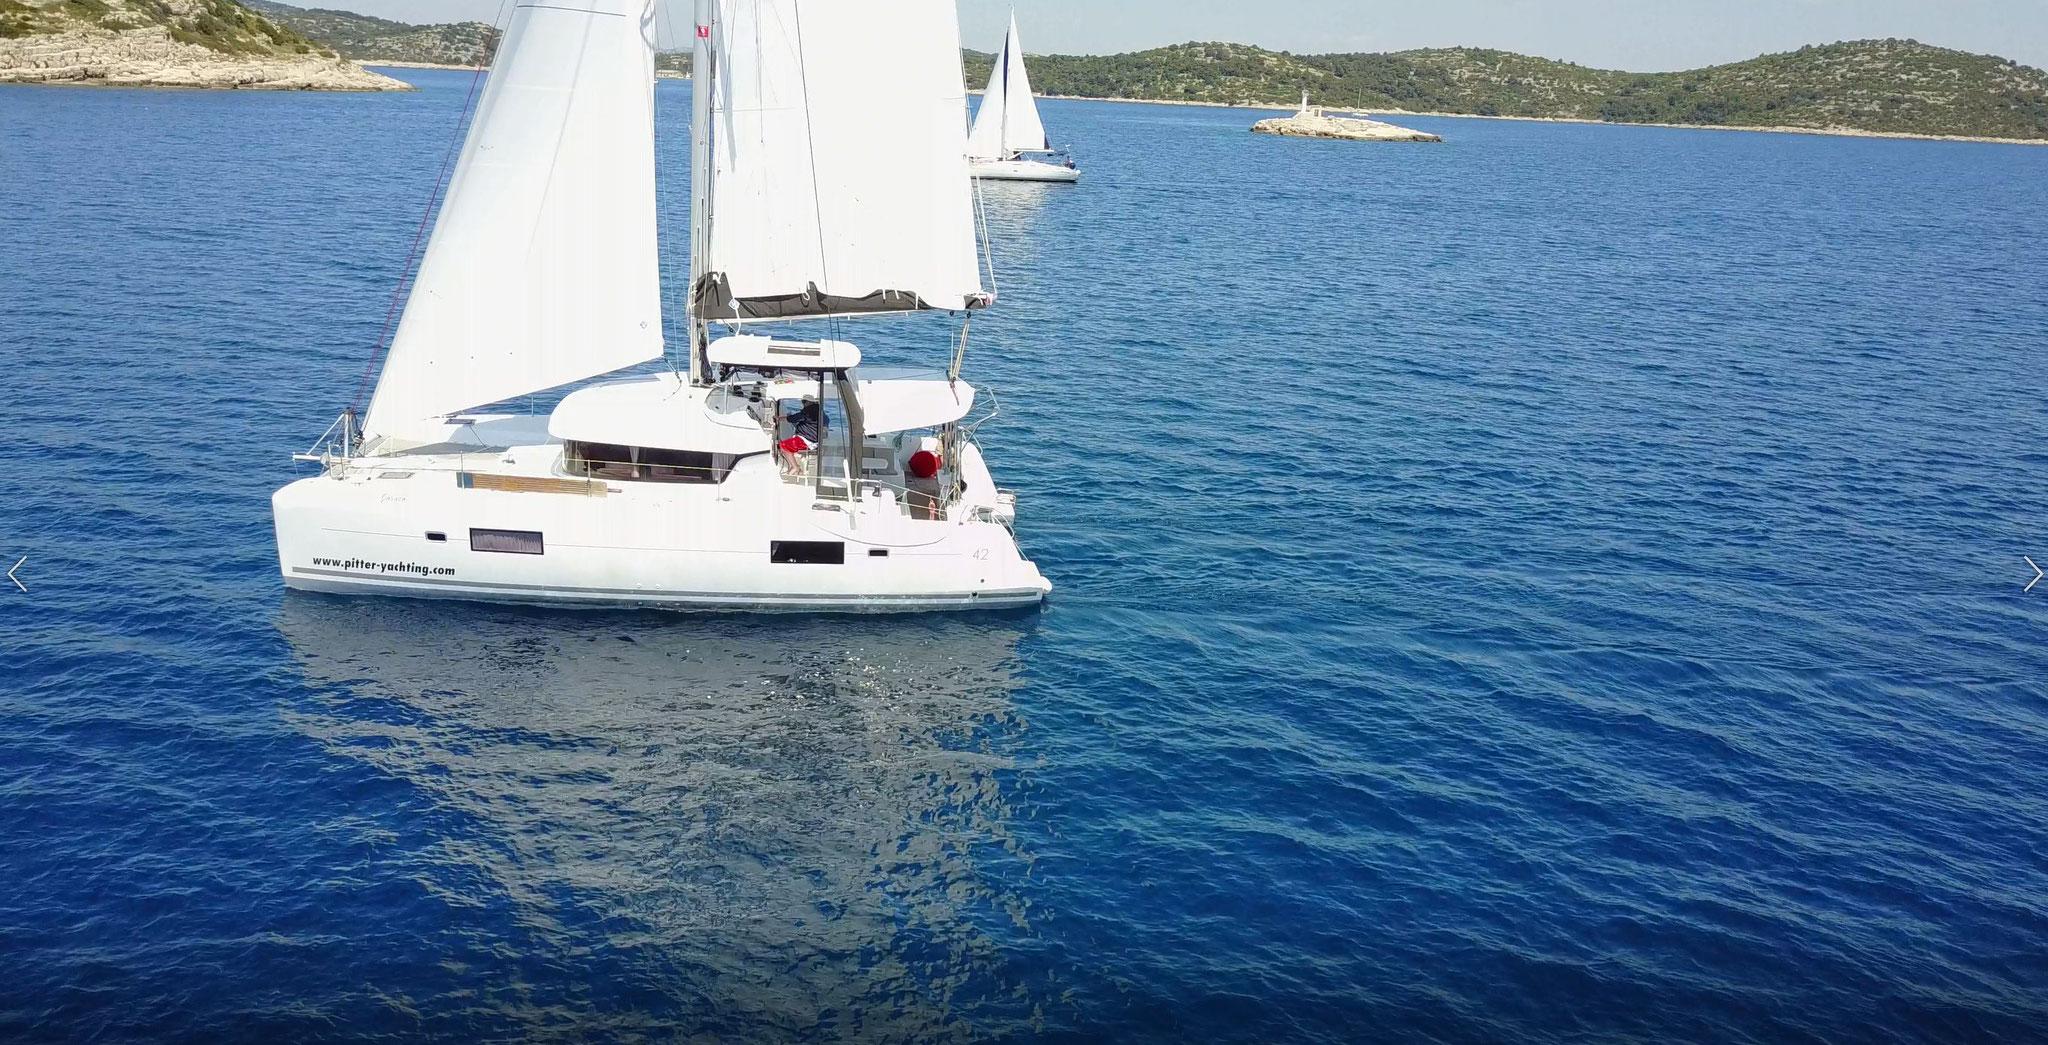 Katamaran segeln als Charter Kroatien von SCT Marina in Trogir - www.katamaramtraum.com